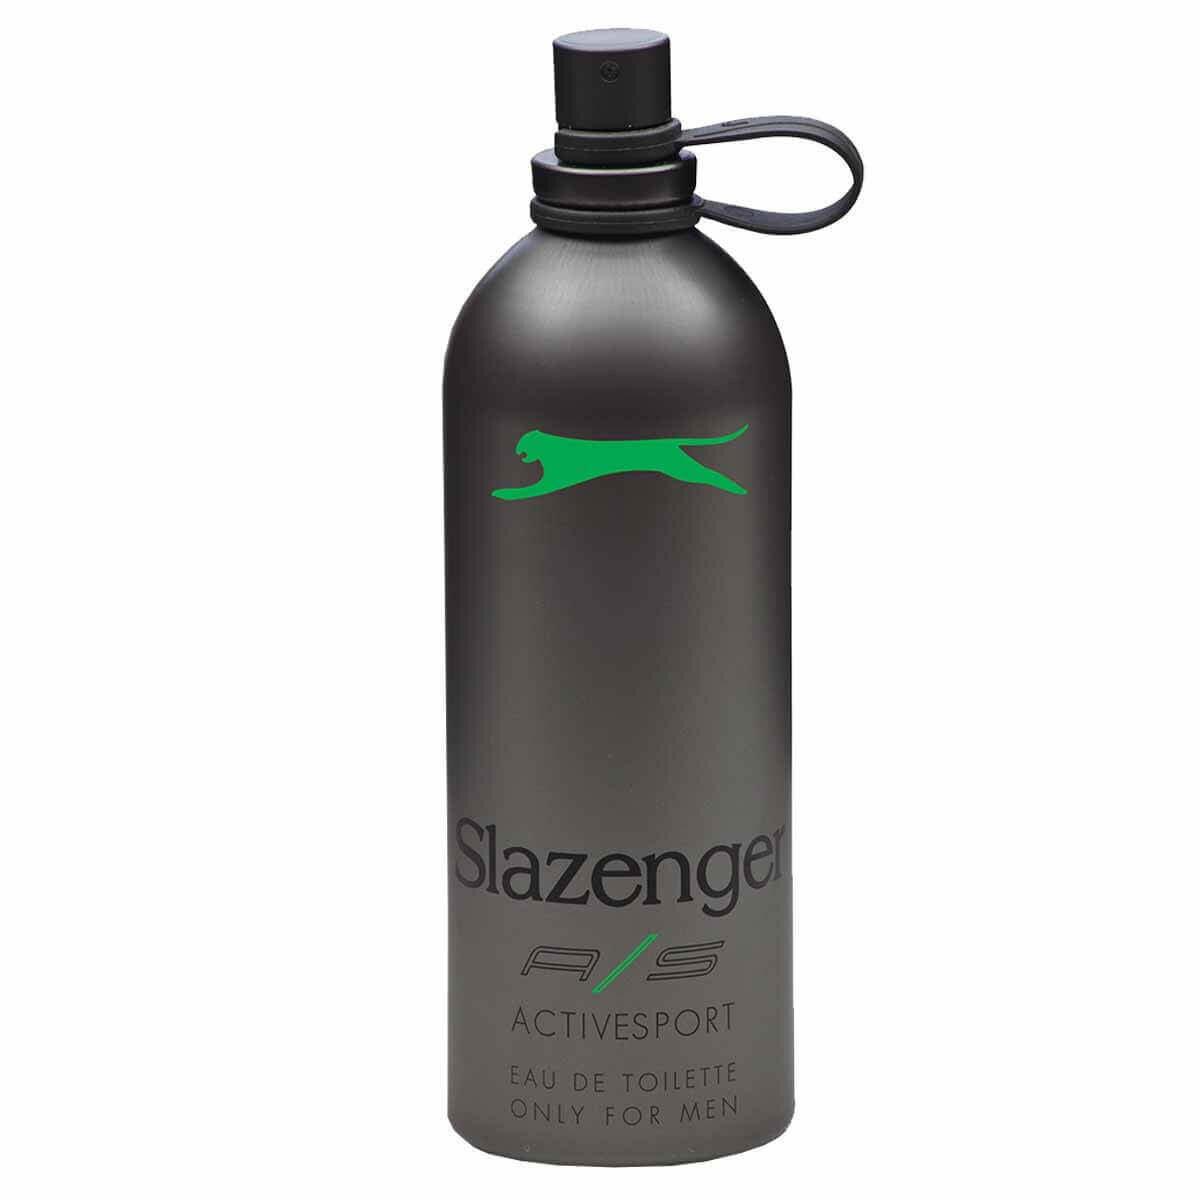 Yeşil Activesport Erkek Parfüm Edt 125 ml